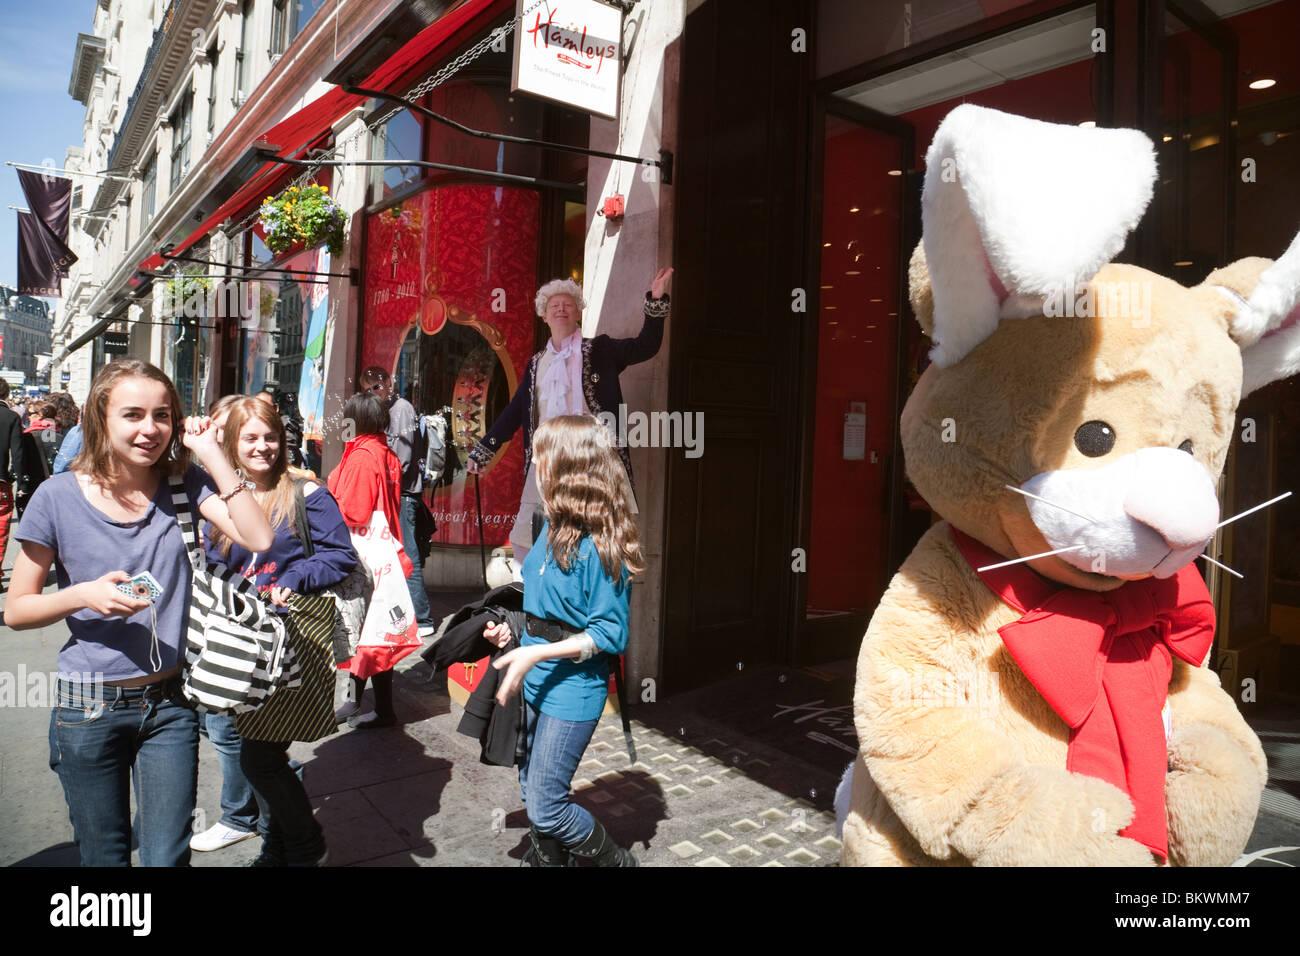 250th anniversary of Hamleys toystore, Regent Street, London UK Stock Photo